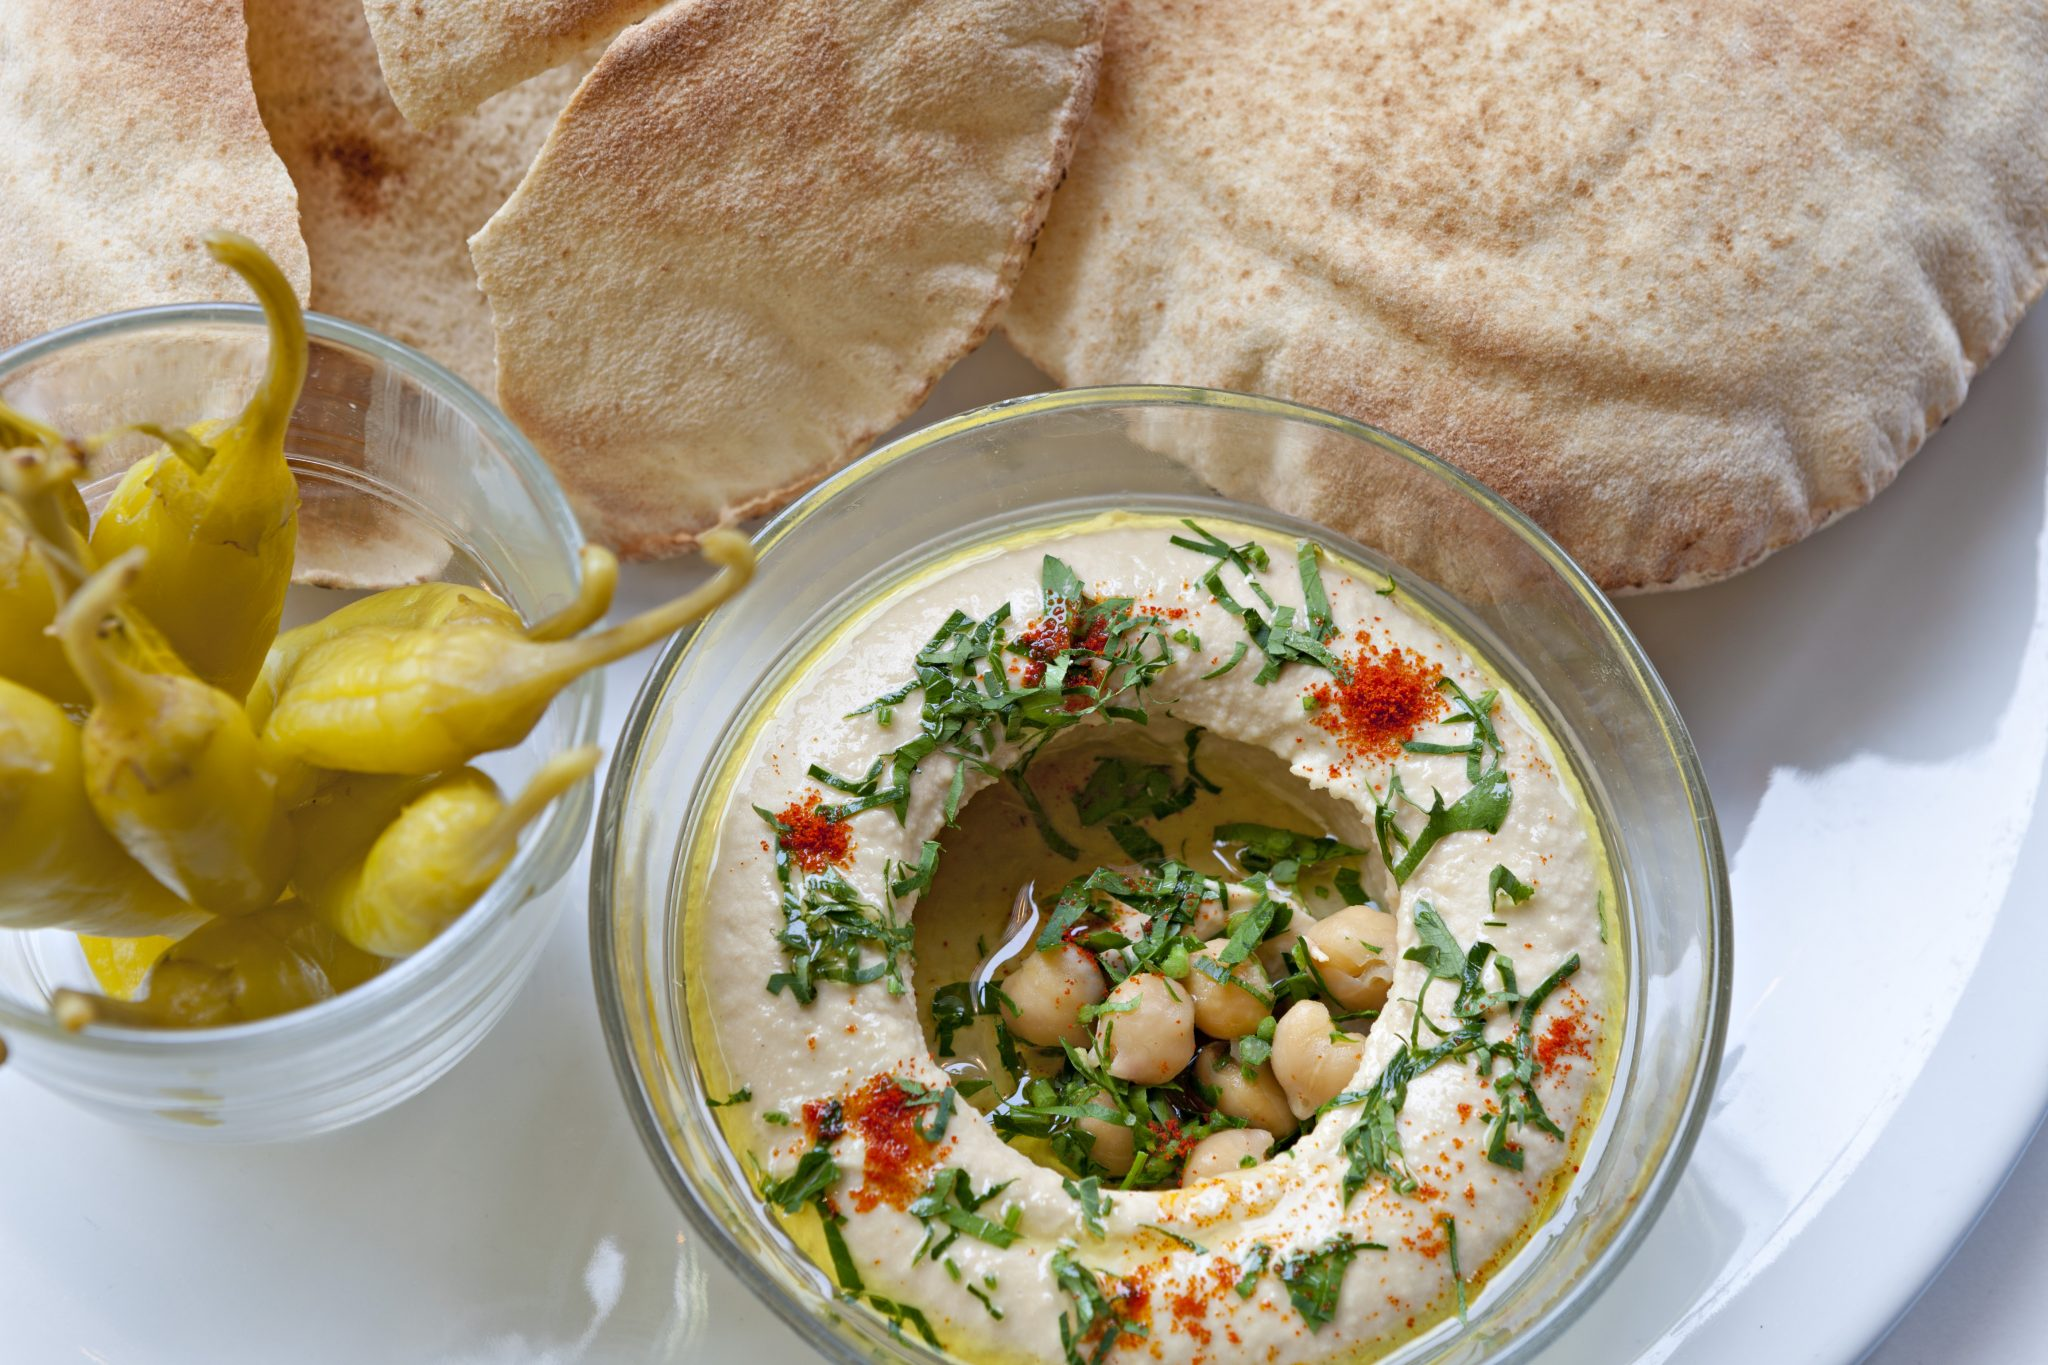 Comptoir Libanais Soho hummus